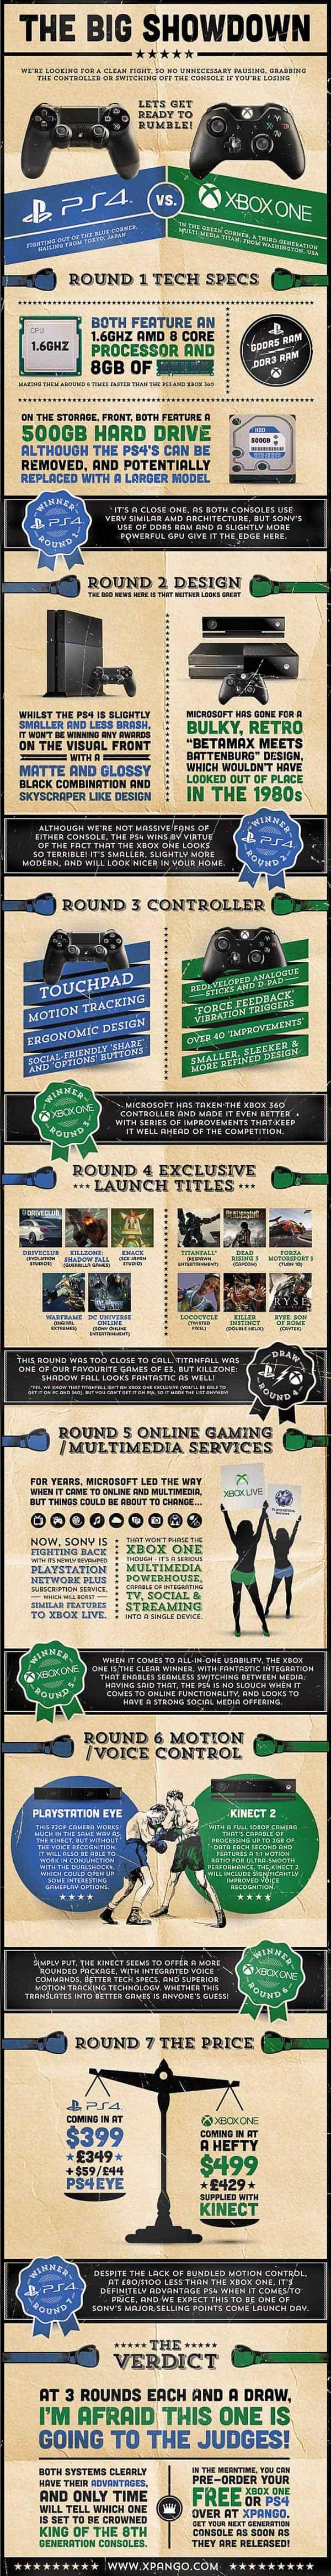 Big Showdown Infographic